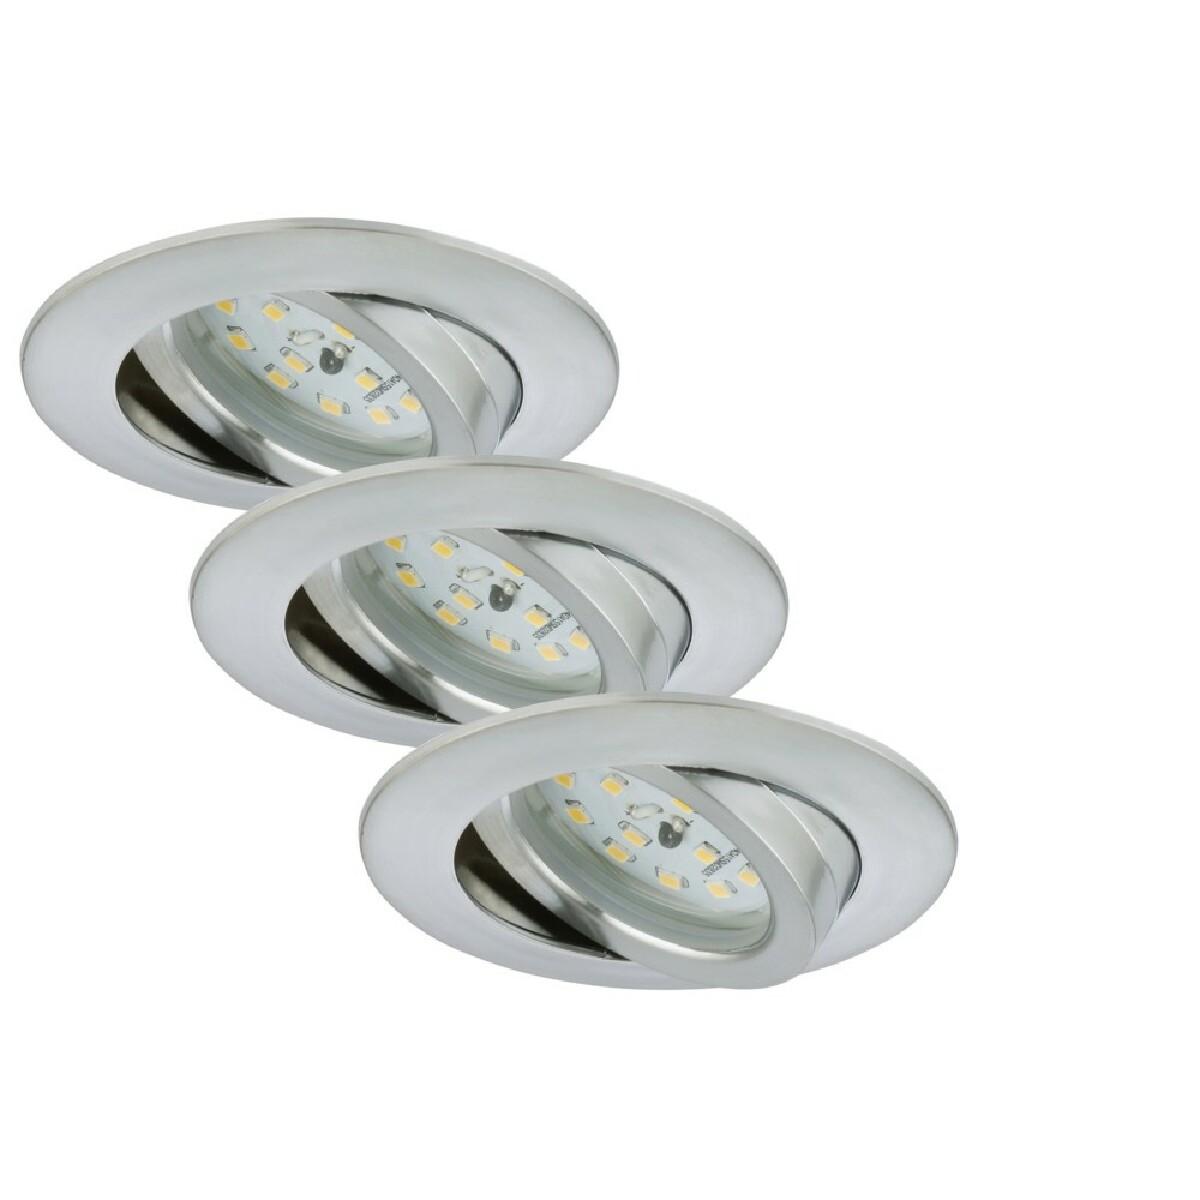 Briloner Leuchten Set 3 Spots Encastrable LED Orientable BRILONER Module 5W Ip23 Alu Rond